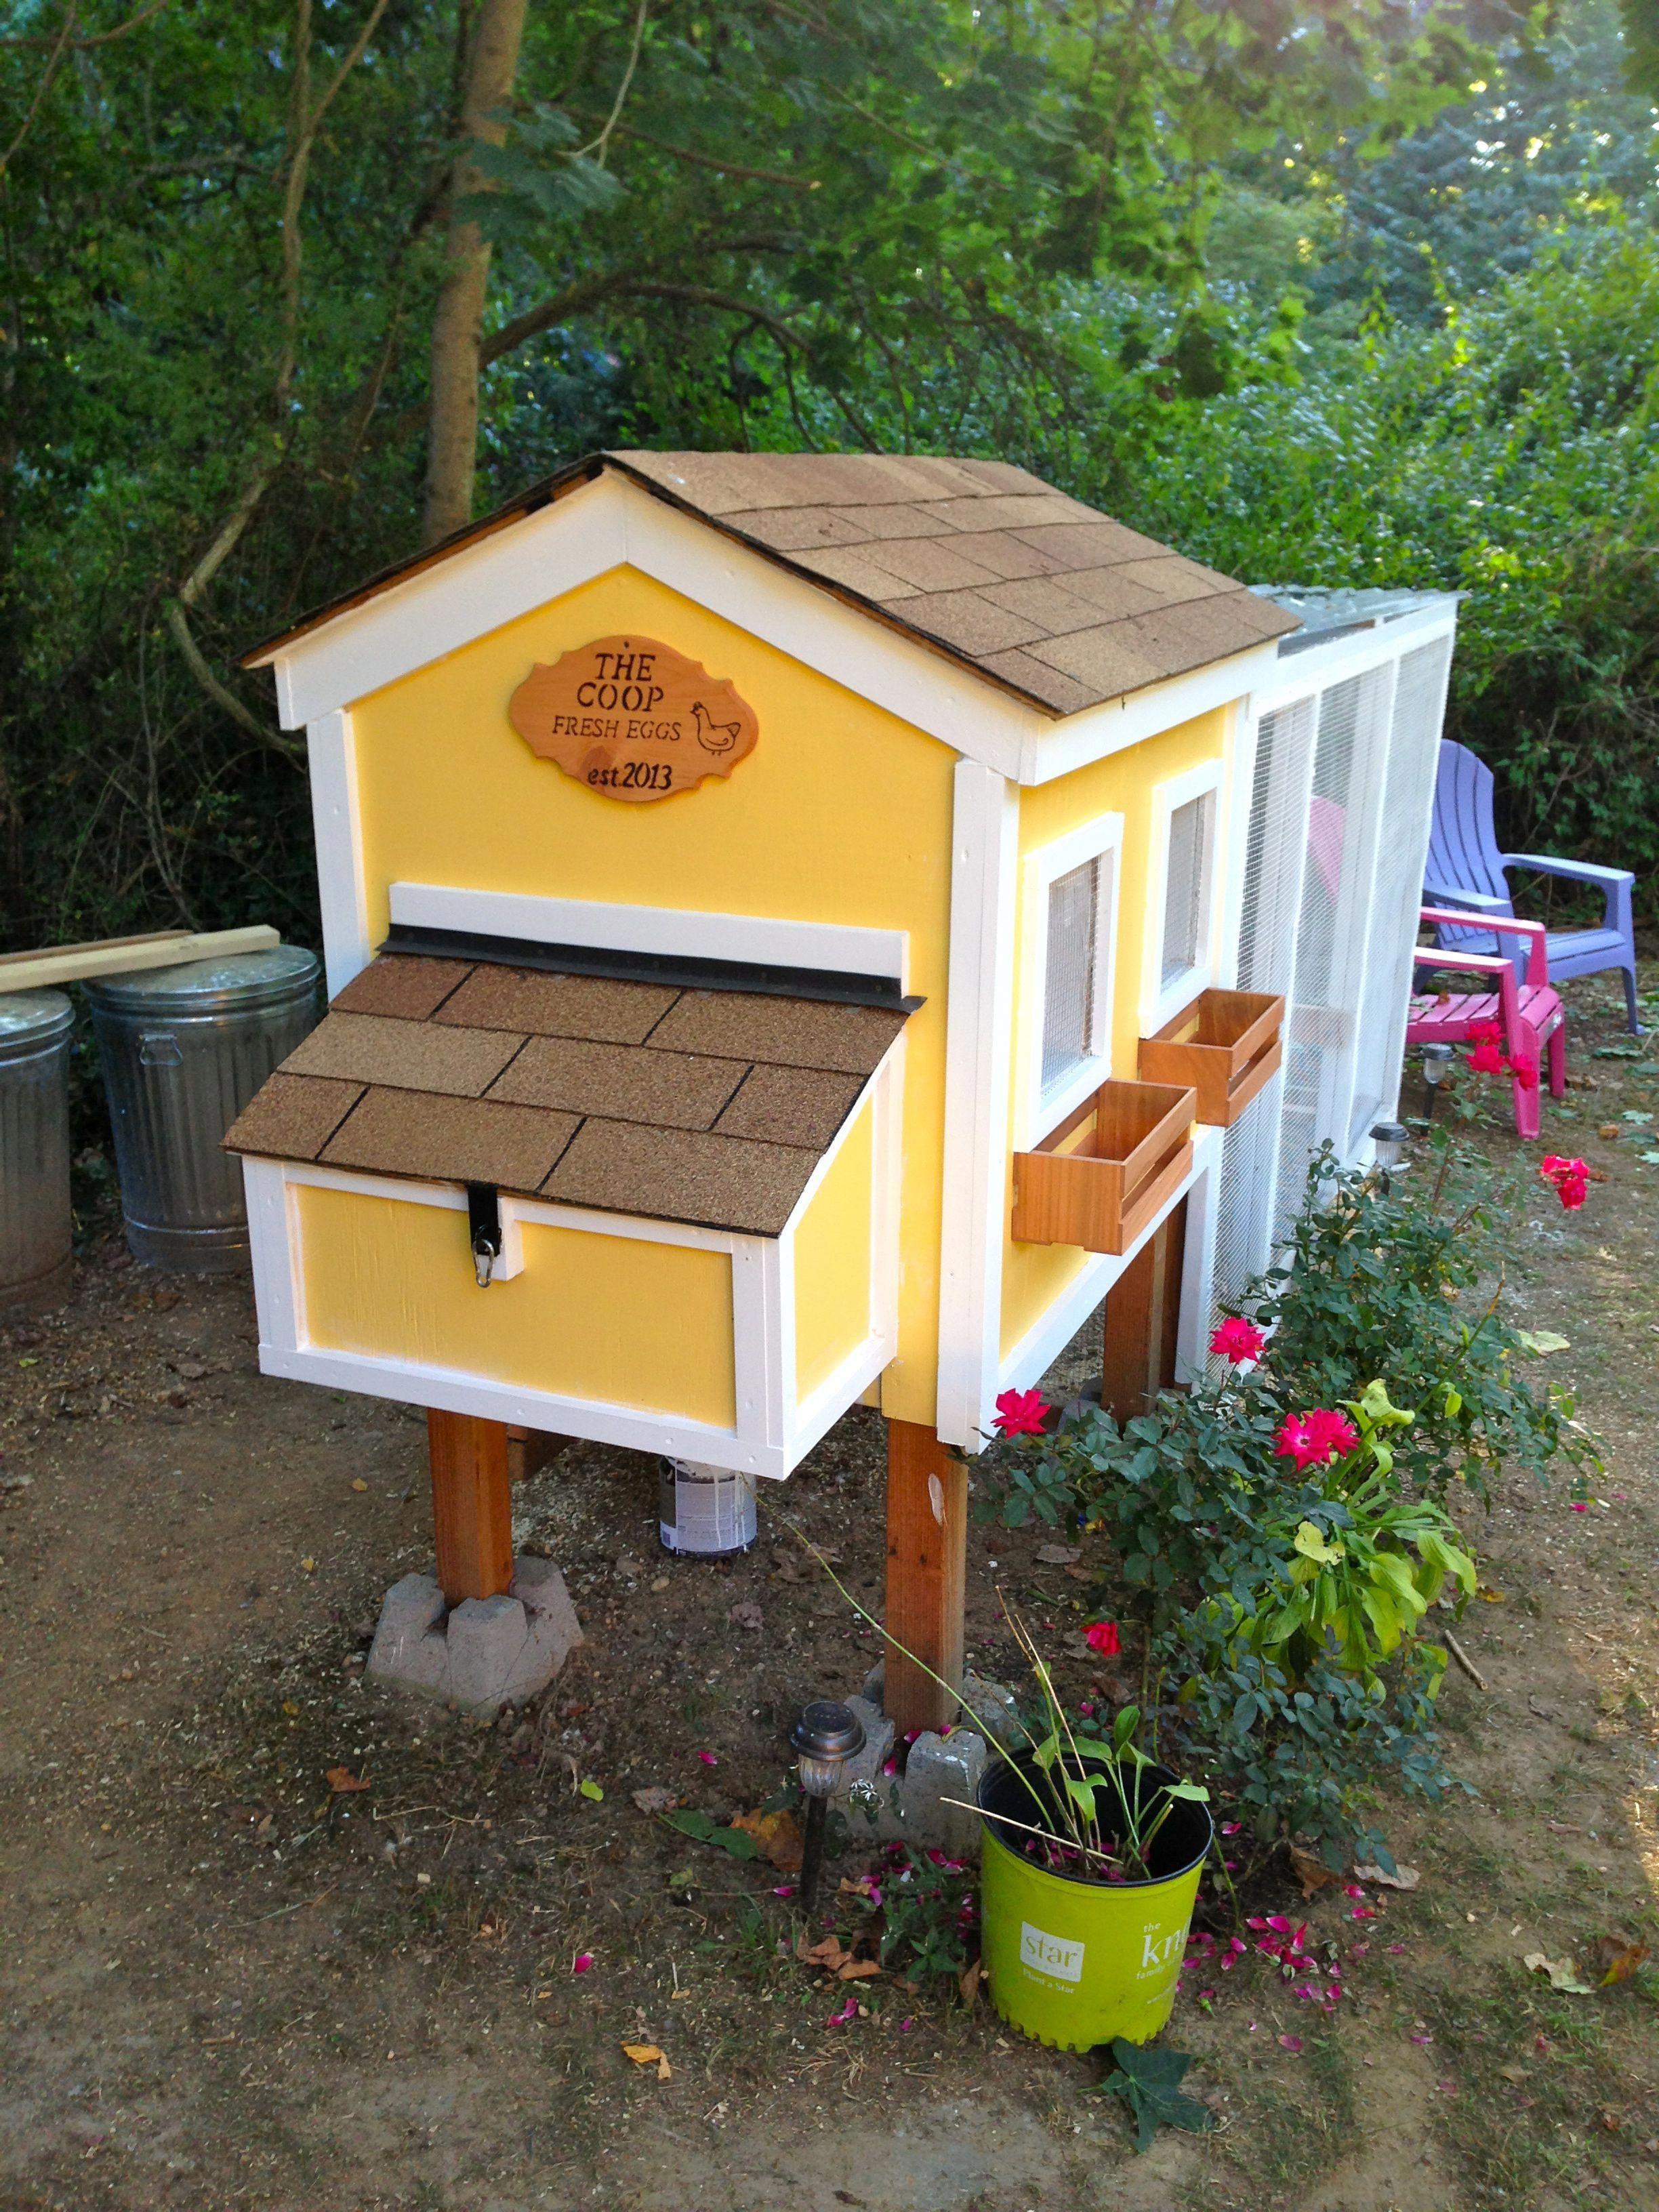 22 Low Budget Diy Backyard Chicken Coop Plans: Diy Chicken Coop Plans, Diy Chicken Coop, Chickens Backyard